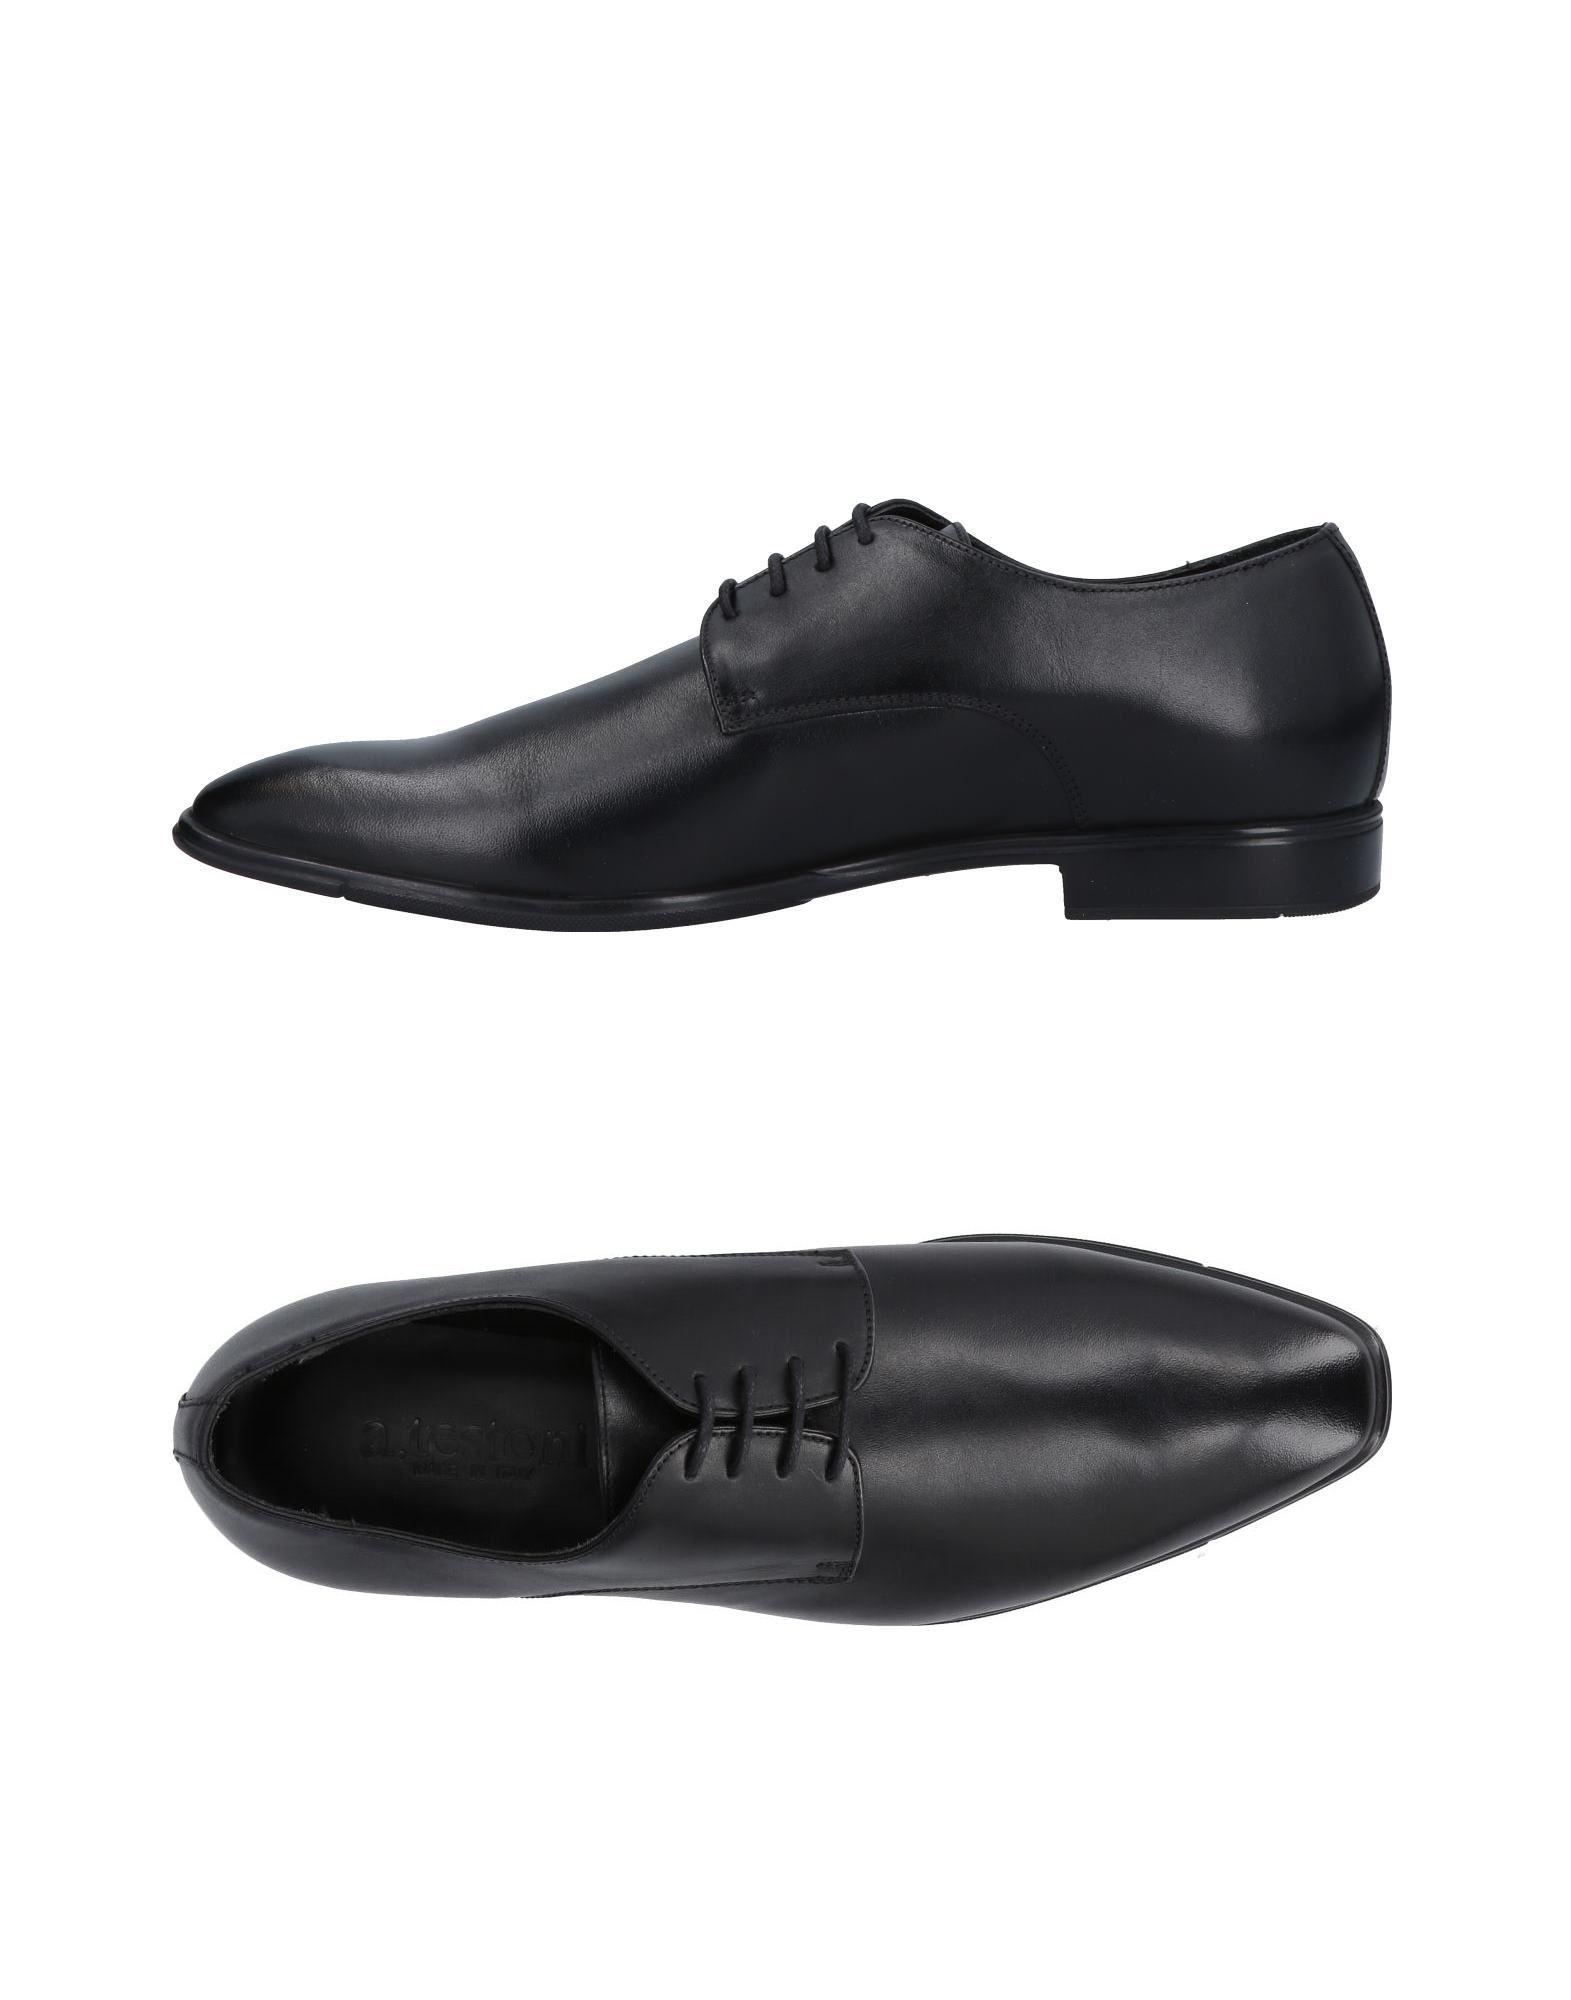 A.TESTONI Обувь на шнурках мужская обувь